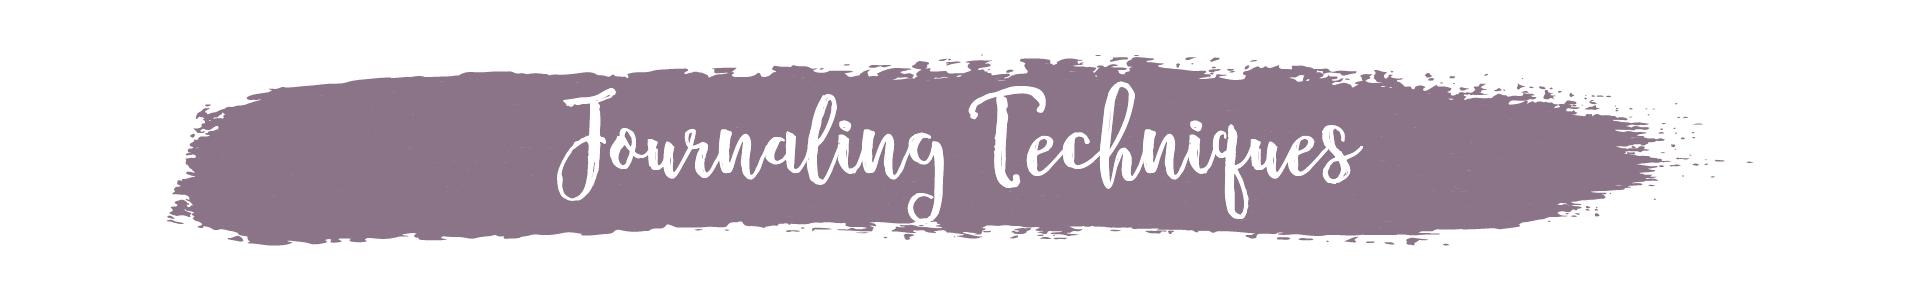 Journaling Techniques header